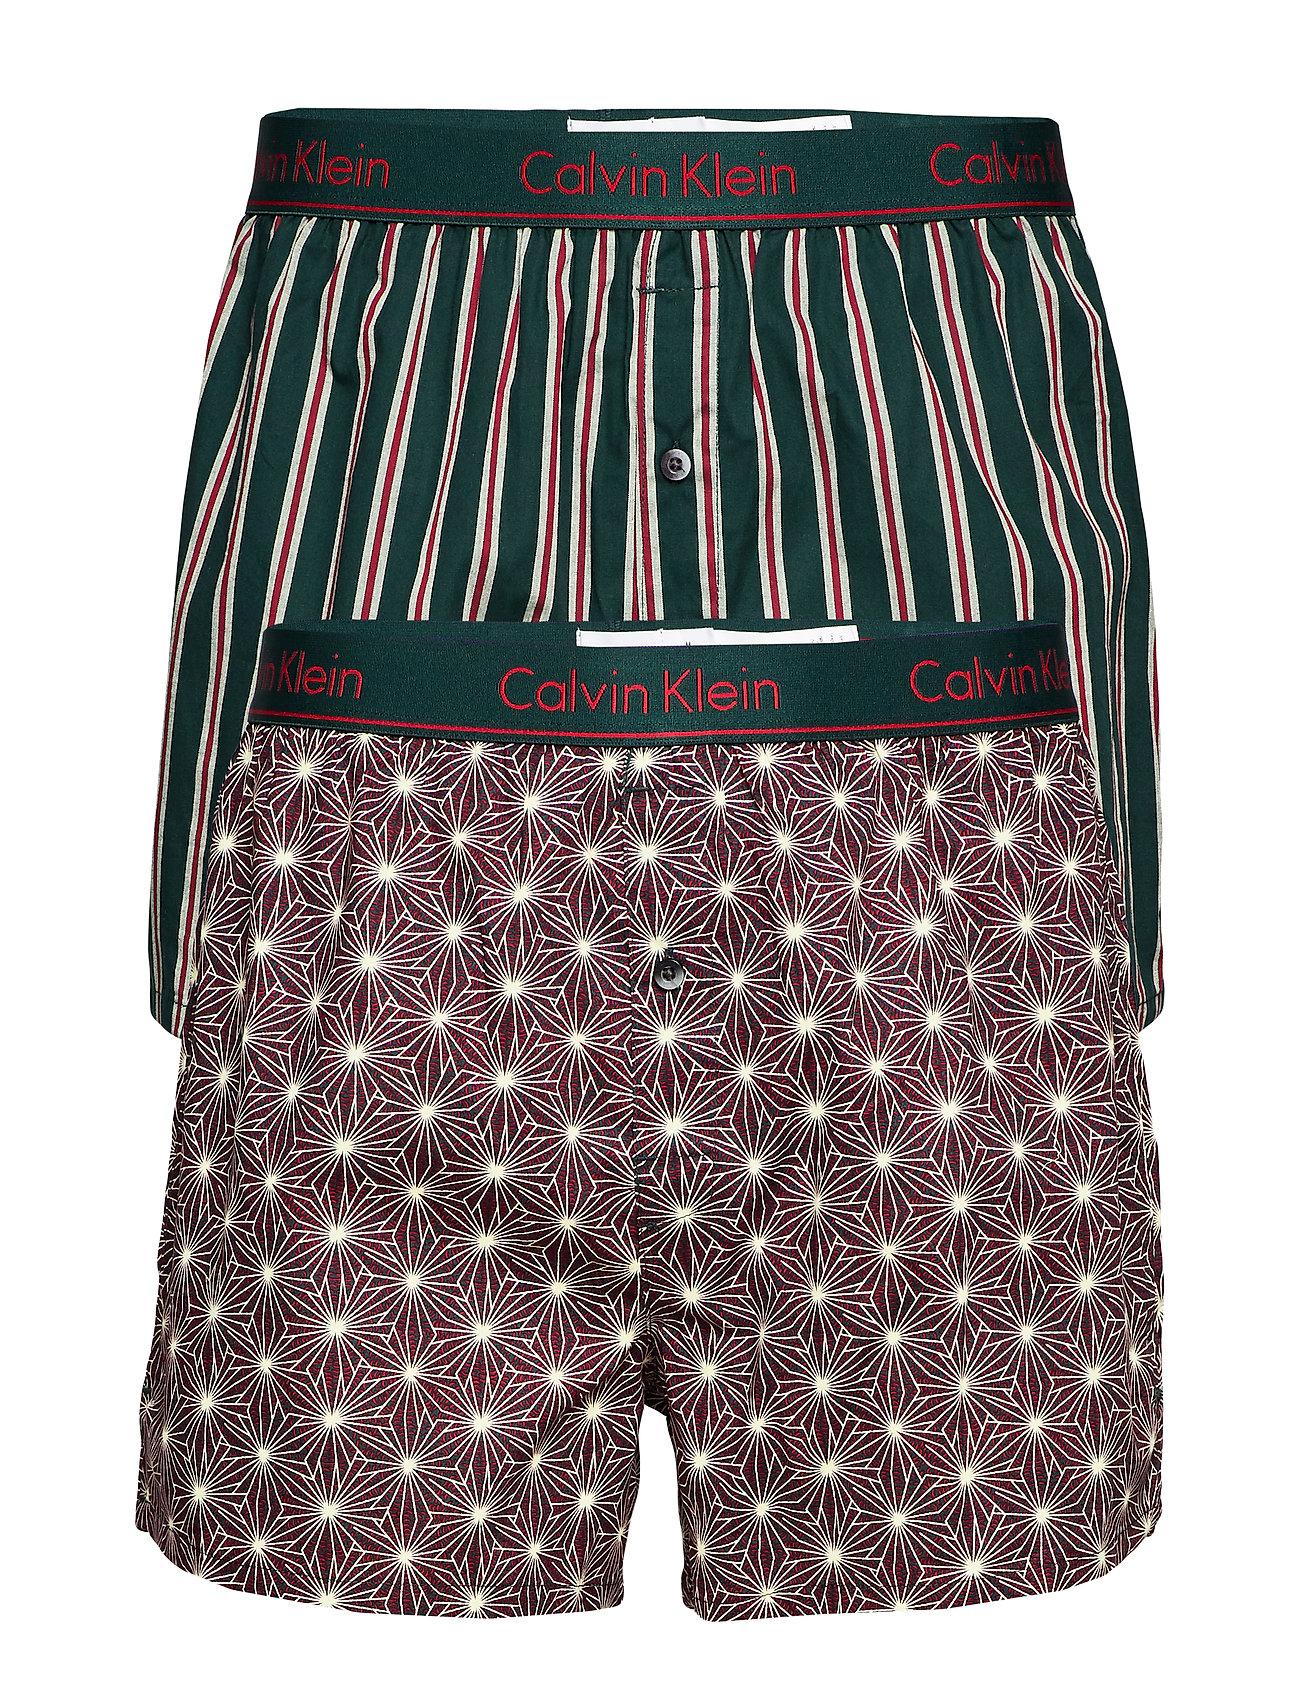 Calvin Klein BOXER SLIM 2PK - STAR WEB PRINT/ PAPER STRIPE